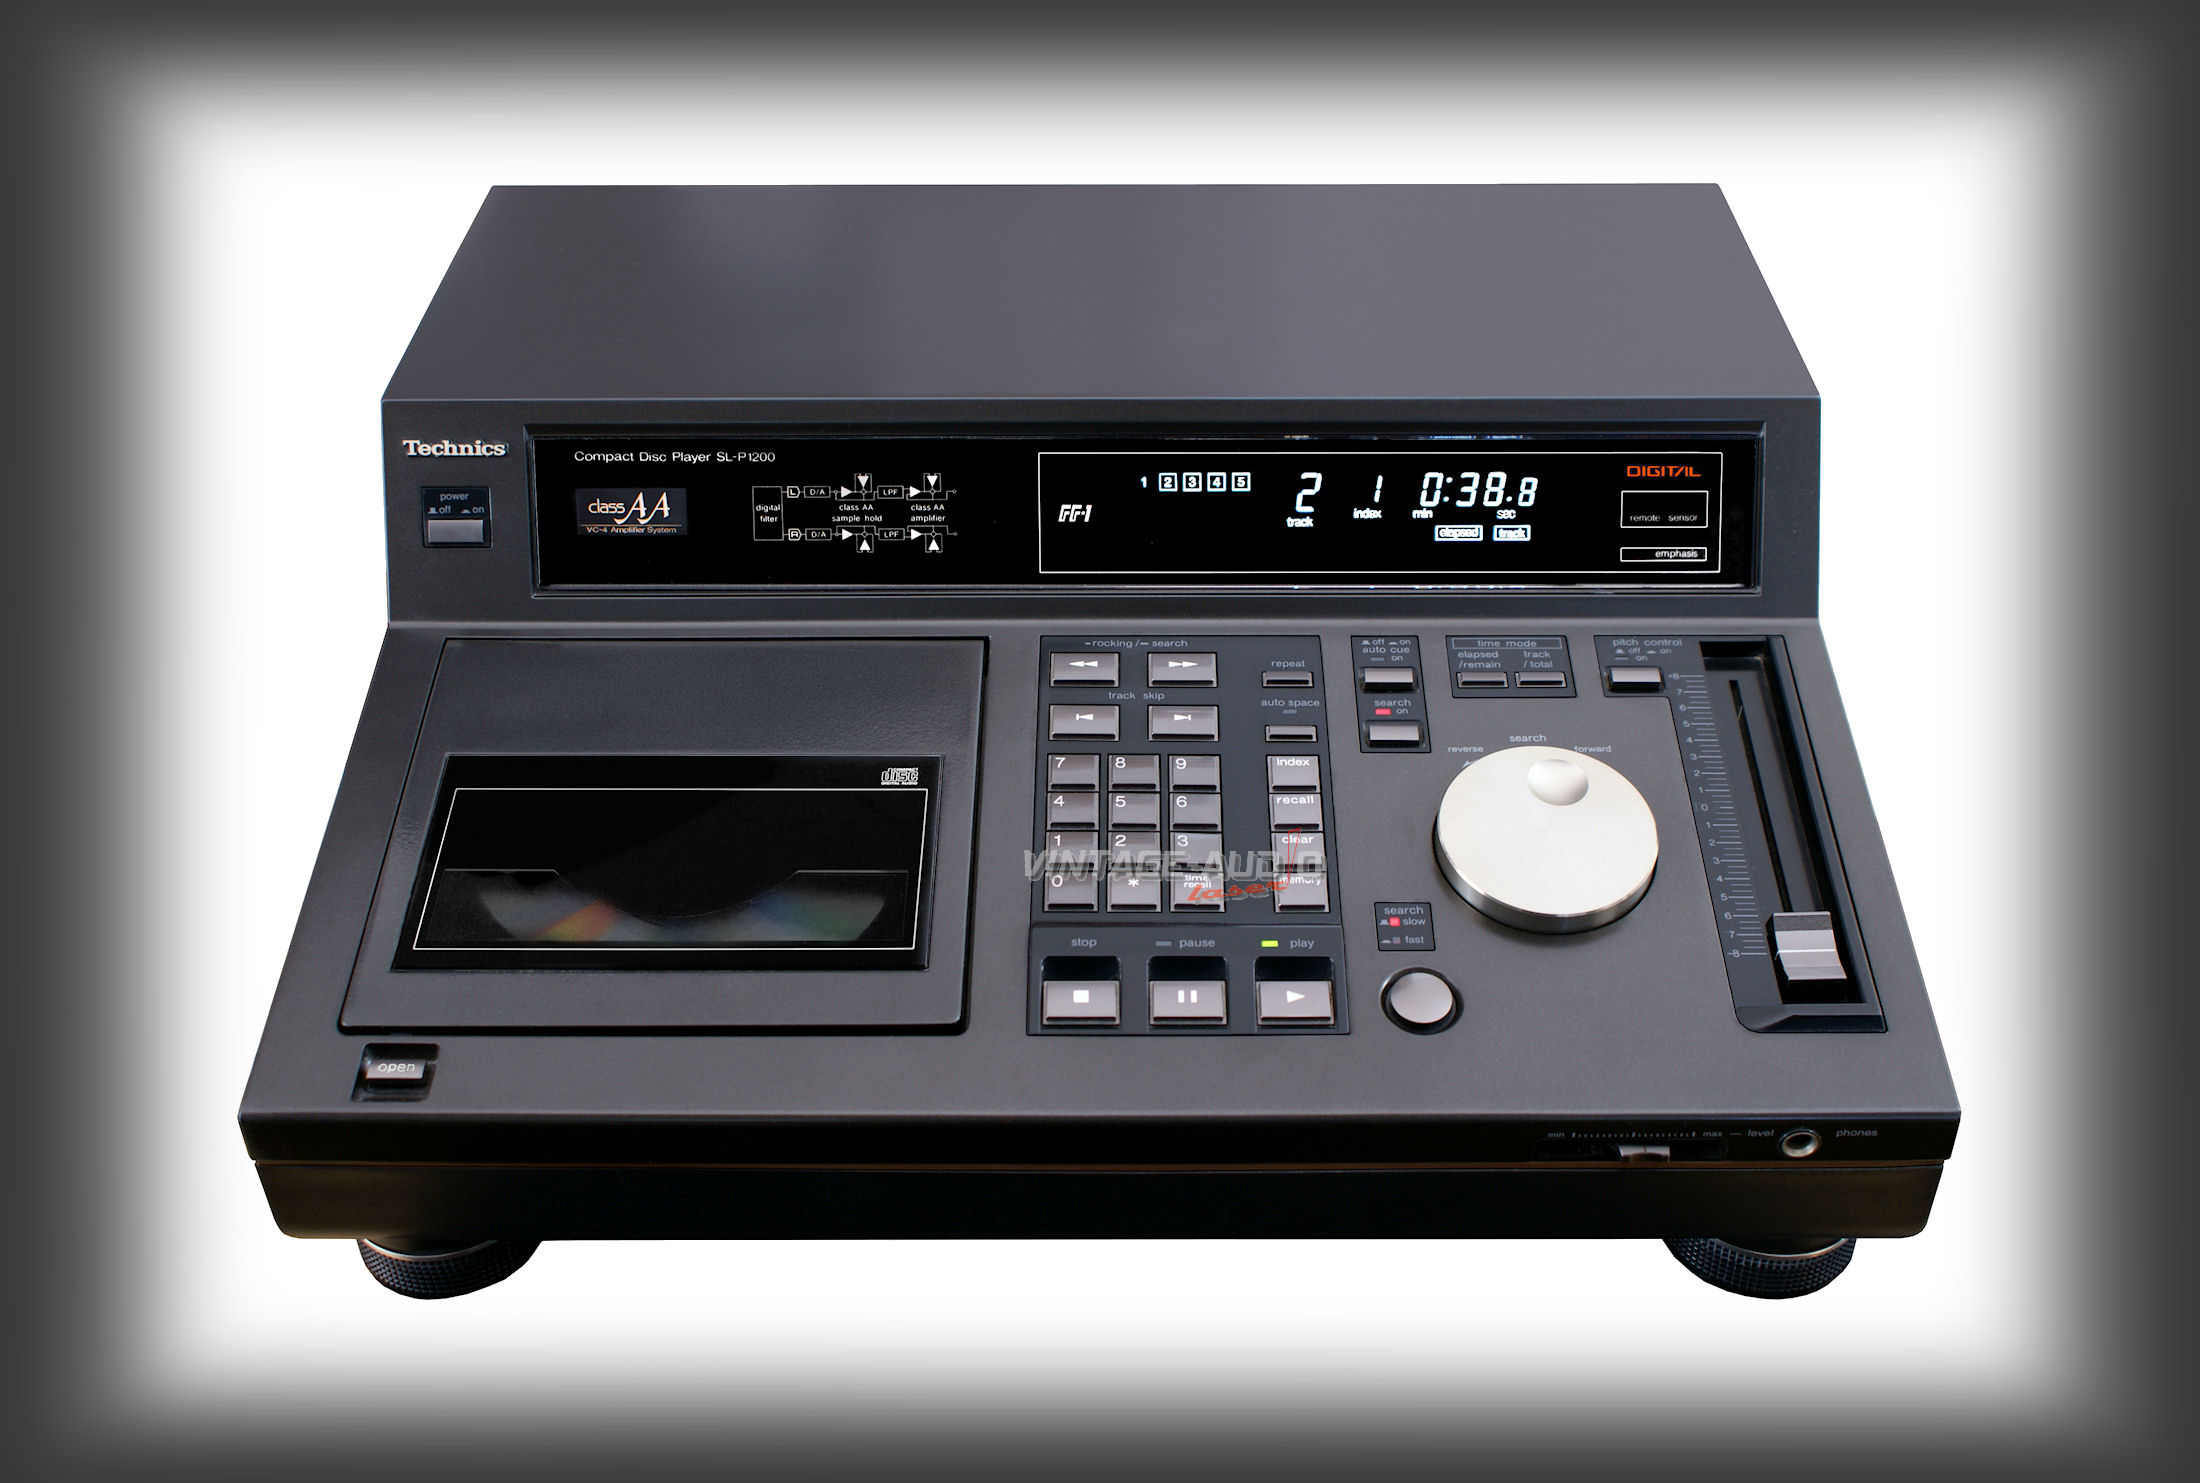 Pioneer CDJ 500II Limited Professional CD Player vs. Technics Professional CD Player SL-P1200 965_vintage-audio-laser_technics_slp1200